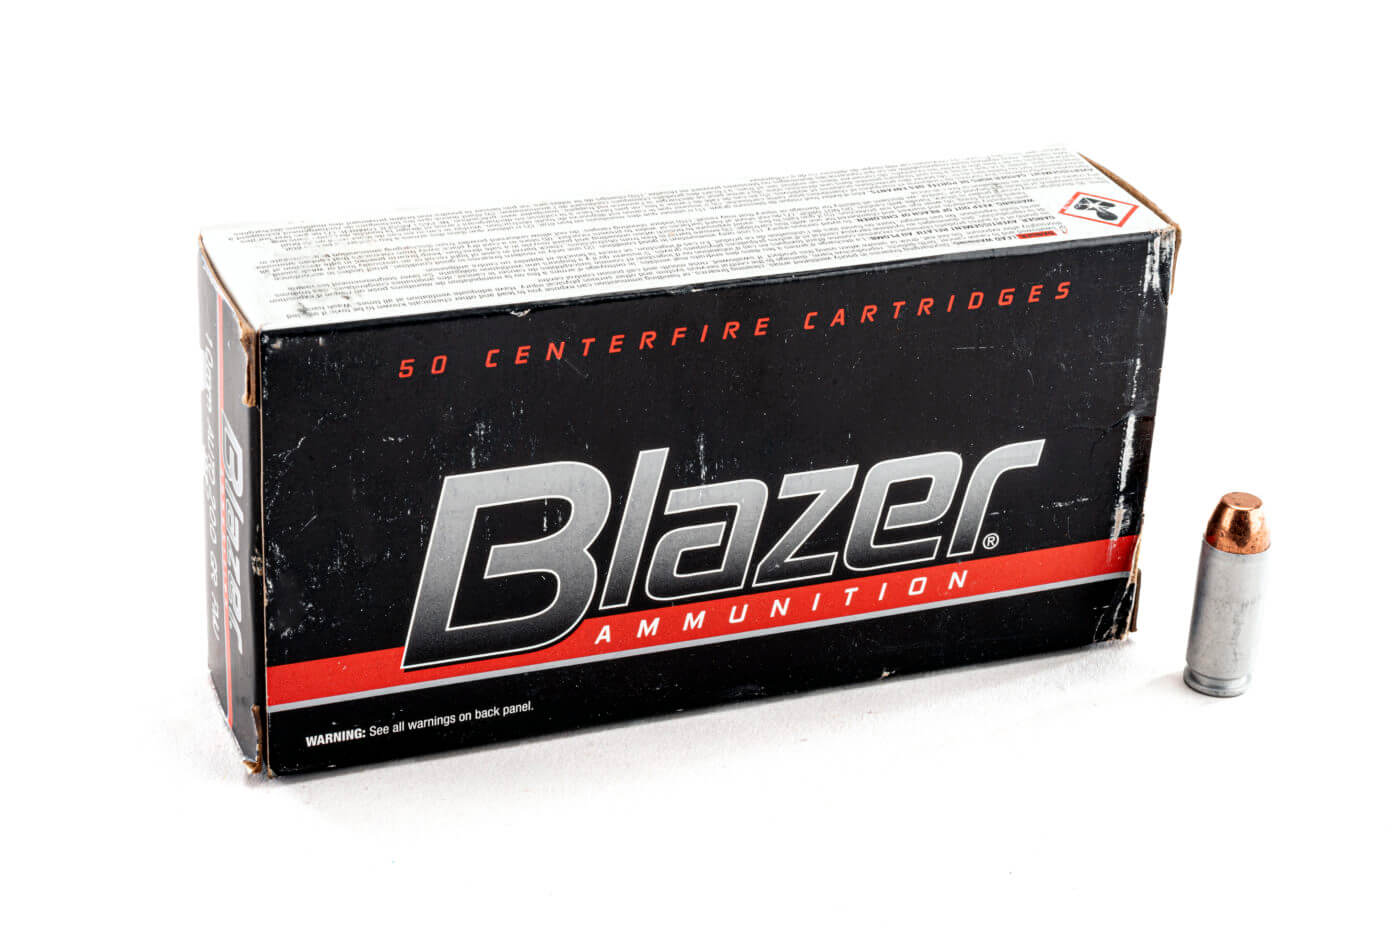 10mm Blazer FMJ ammo for target practice